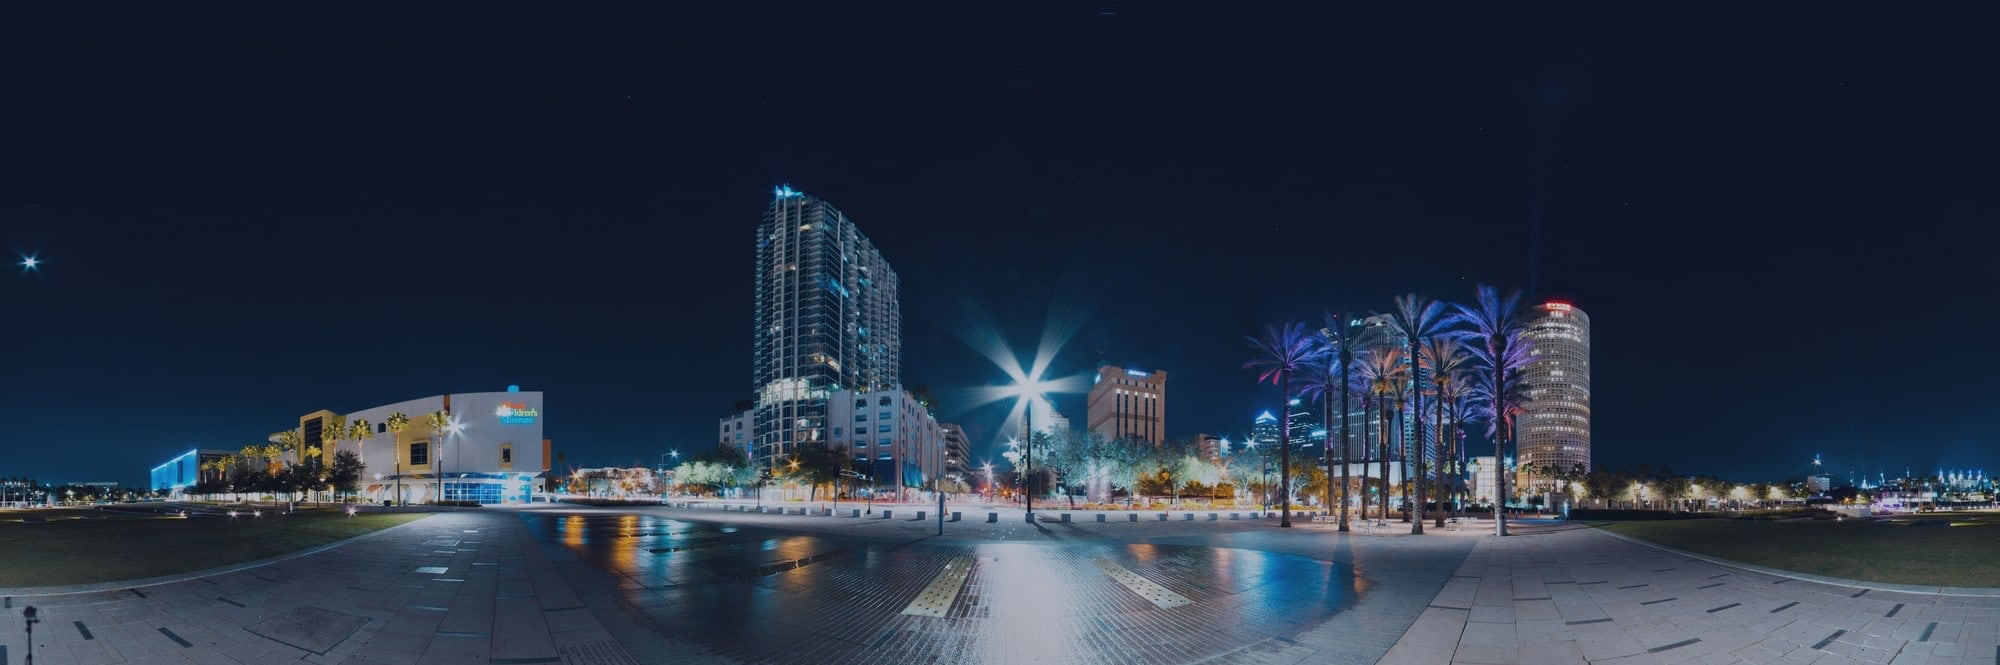 Tampa skyline hero image